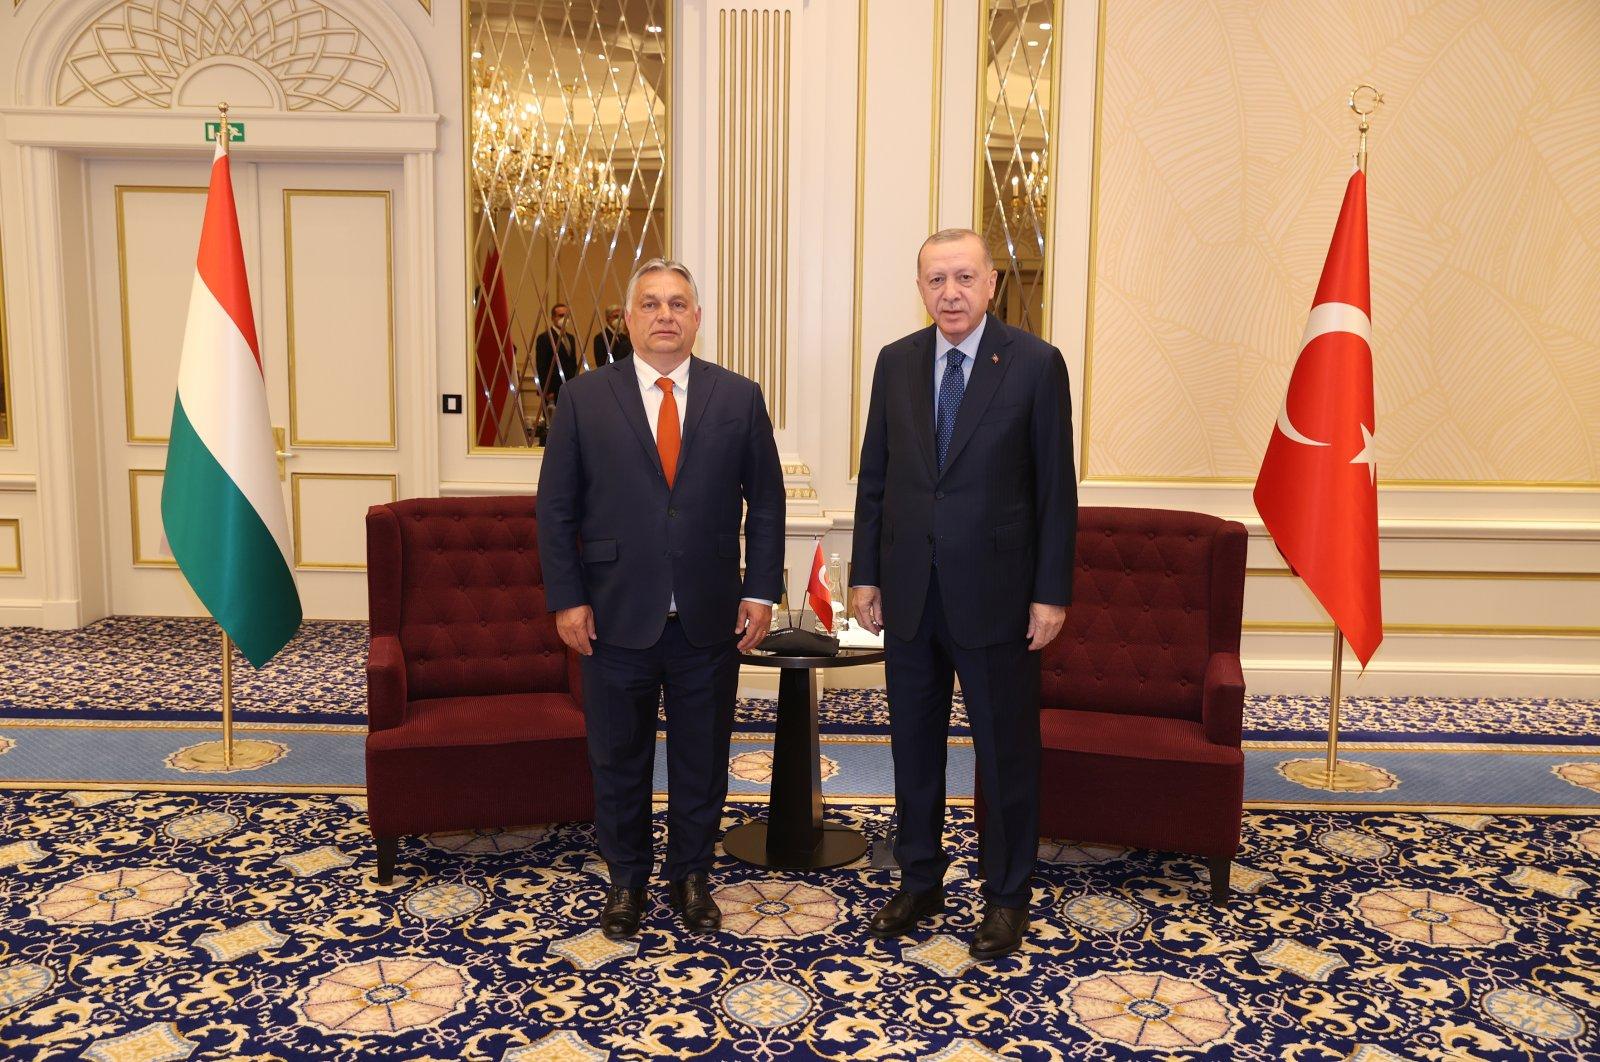 President Recep Tayyip Erdoğan (R) and Hungarian Prime Minister Viktor Orban meet in Brussels ahead of the NATO summit, Brussels, Belgium, June 13, 2021. (AA Photo)